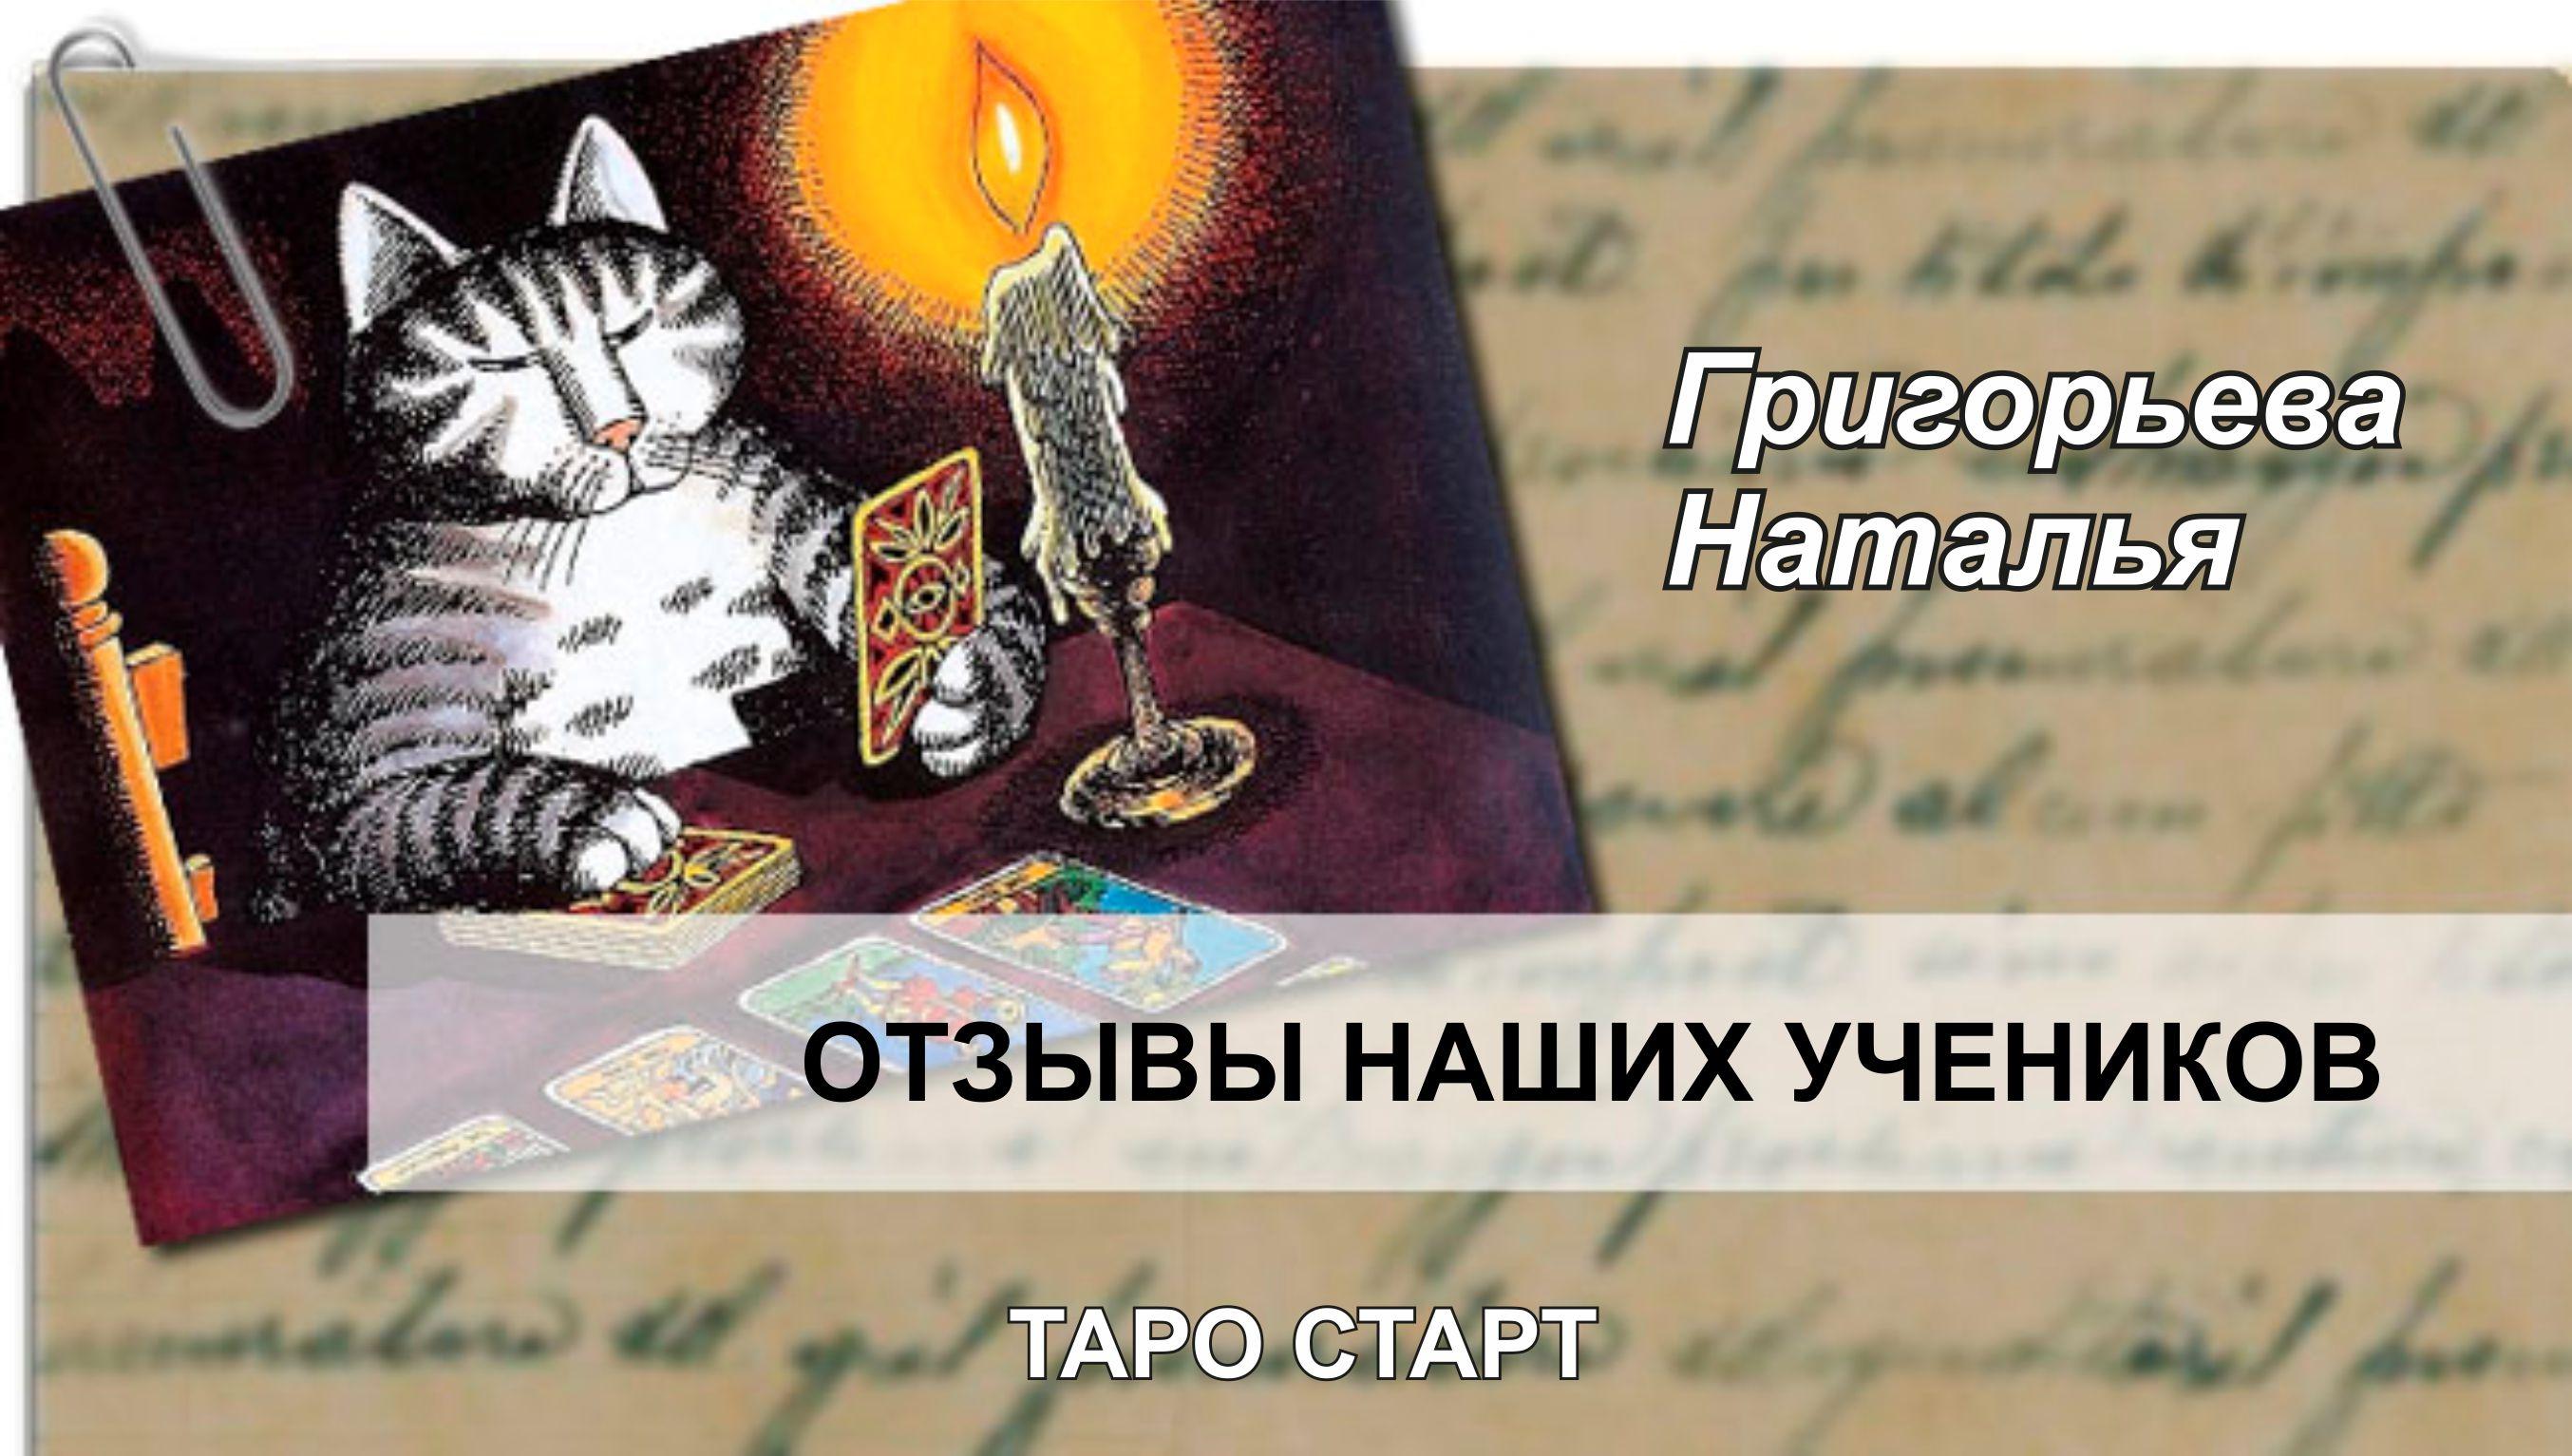 Григорьева Наталья отзыв Таро Старт